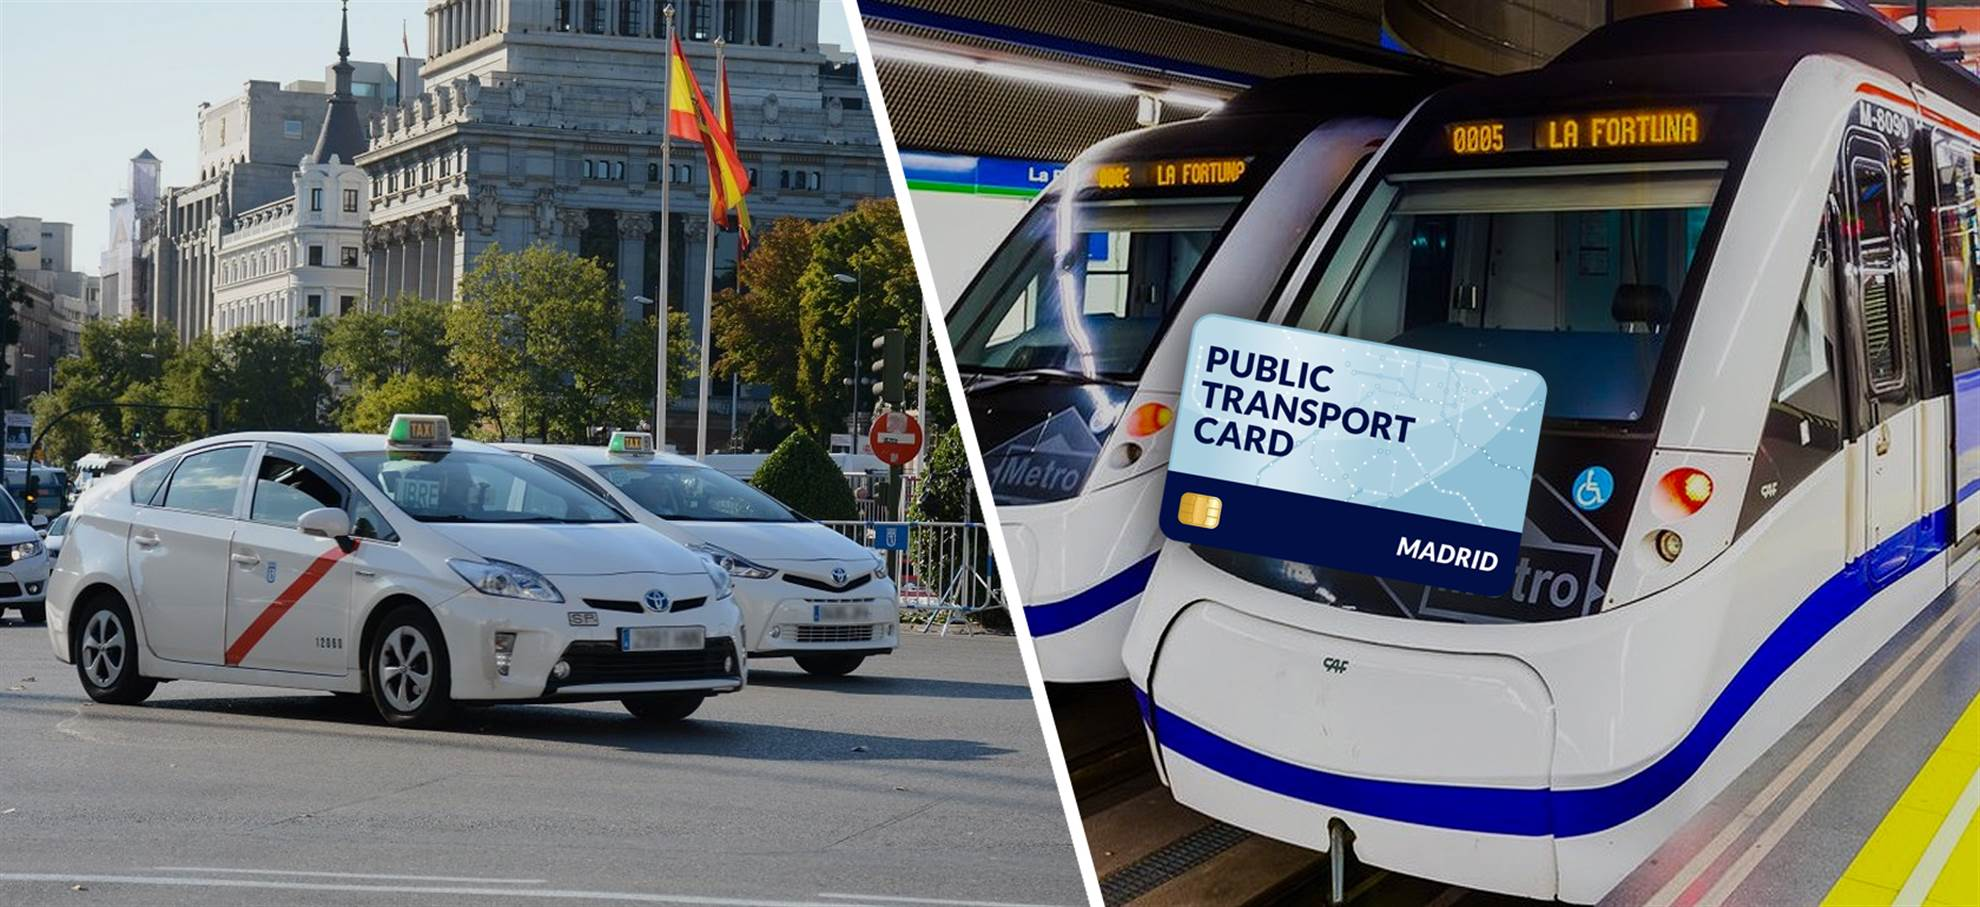 Madrid Travel Card